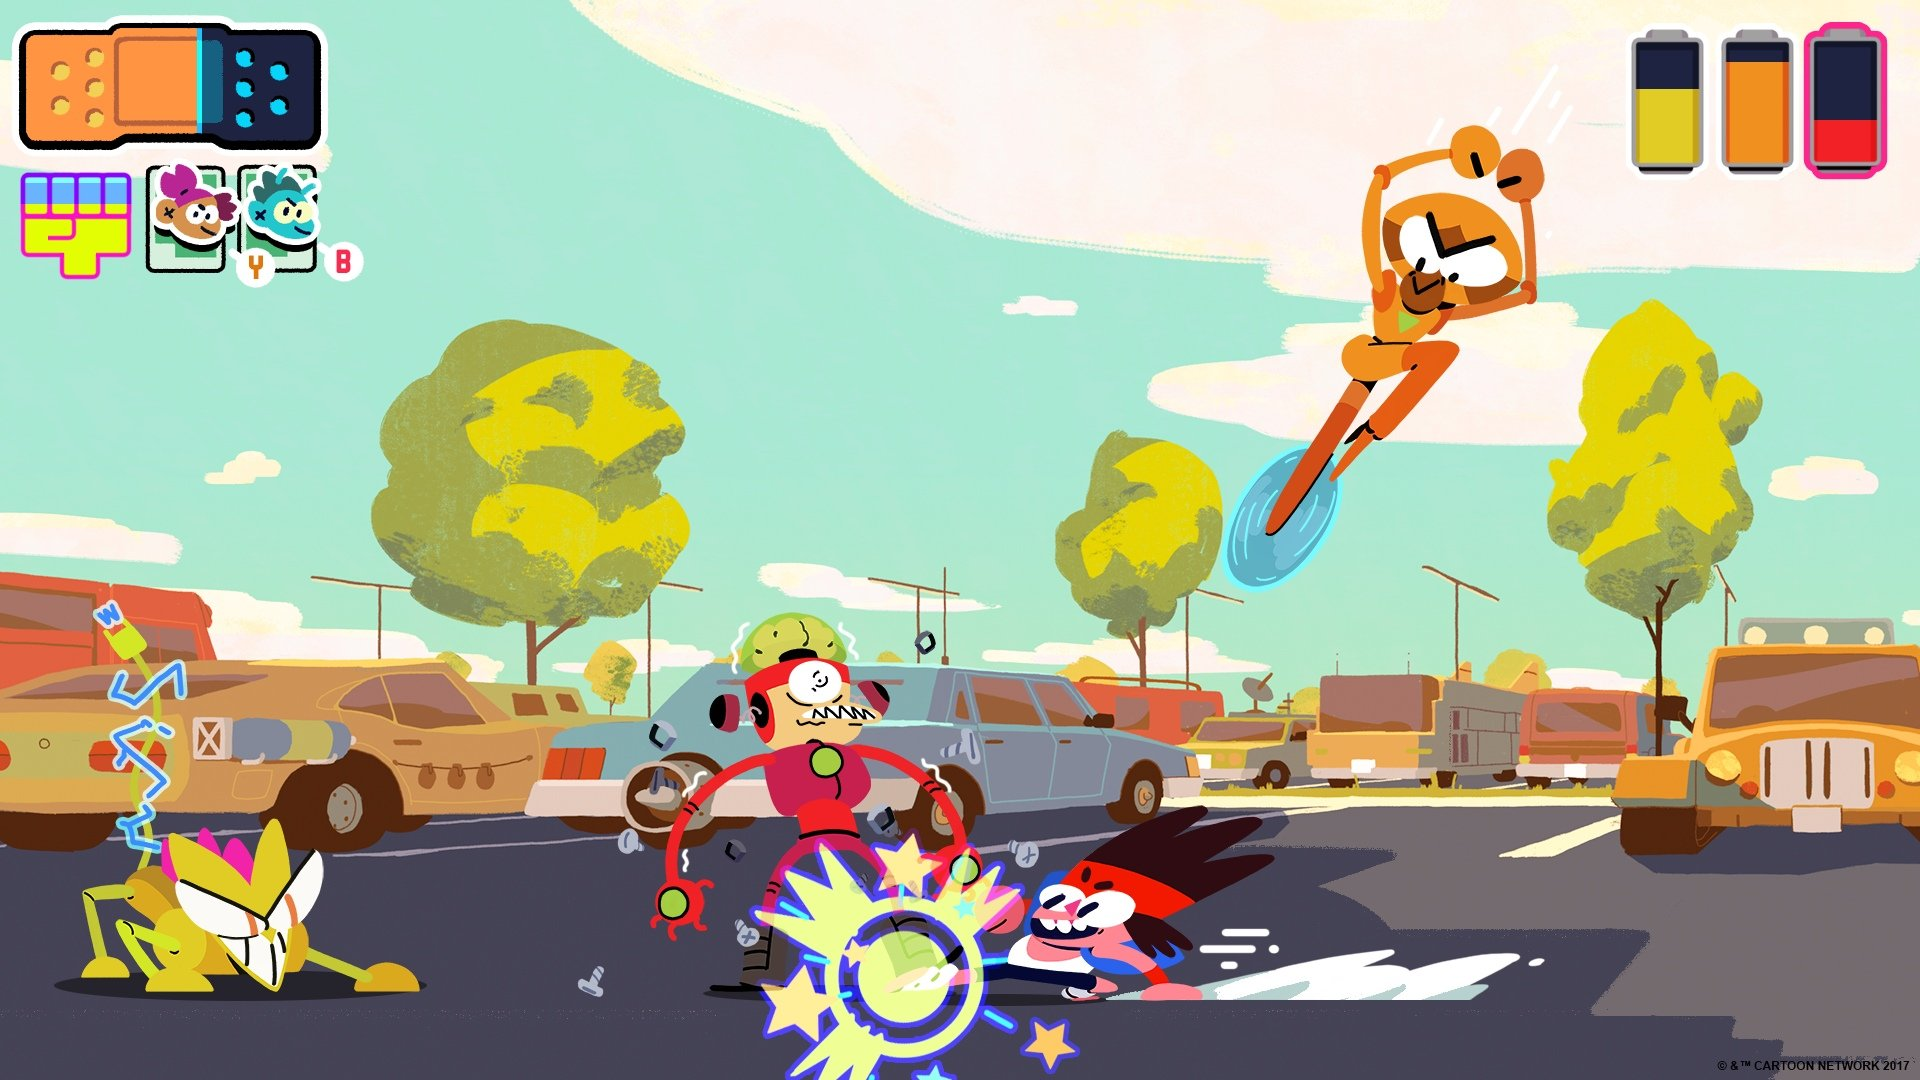 Steven Universe La Serie De Cartoon Network Presenta